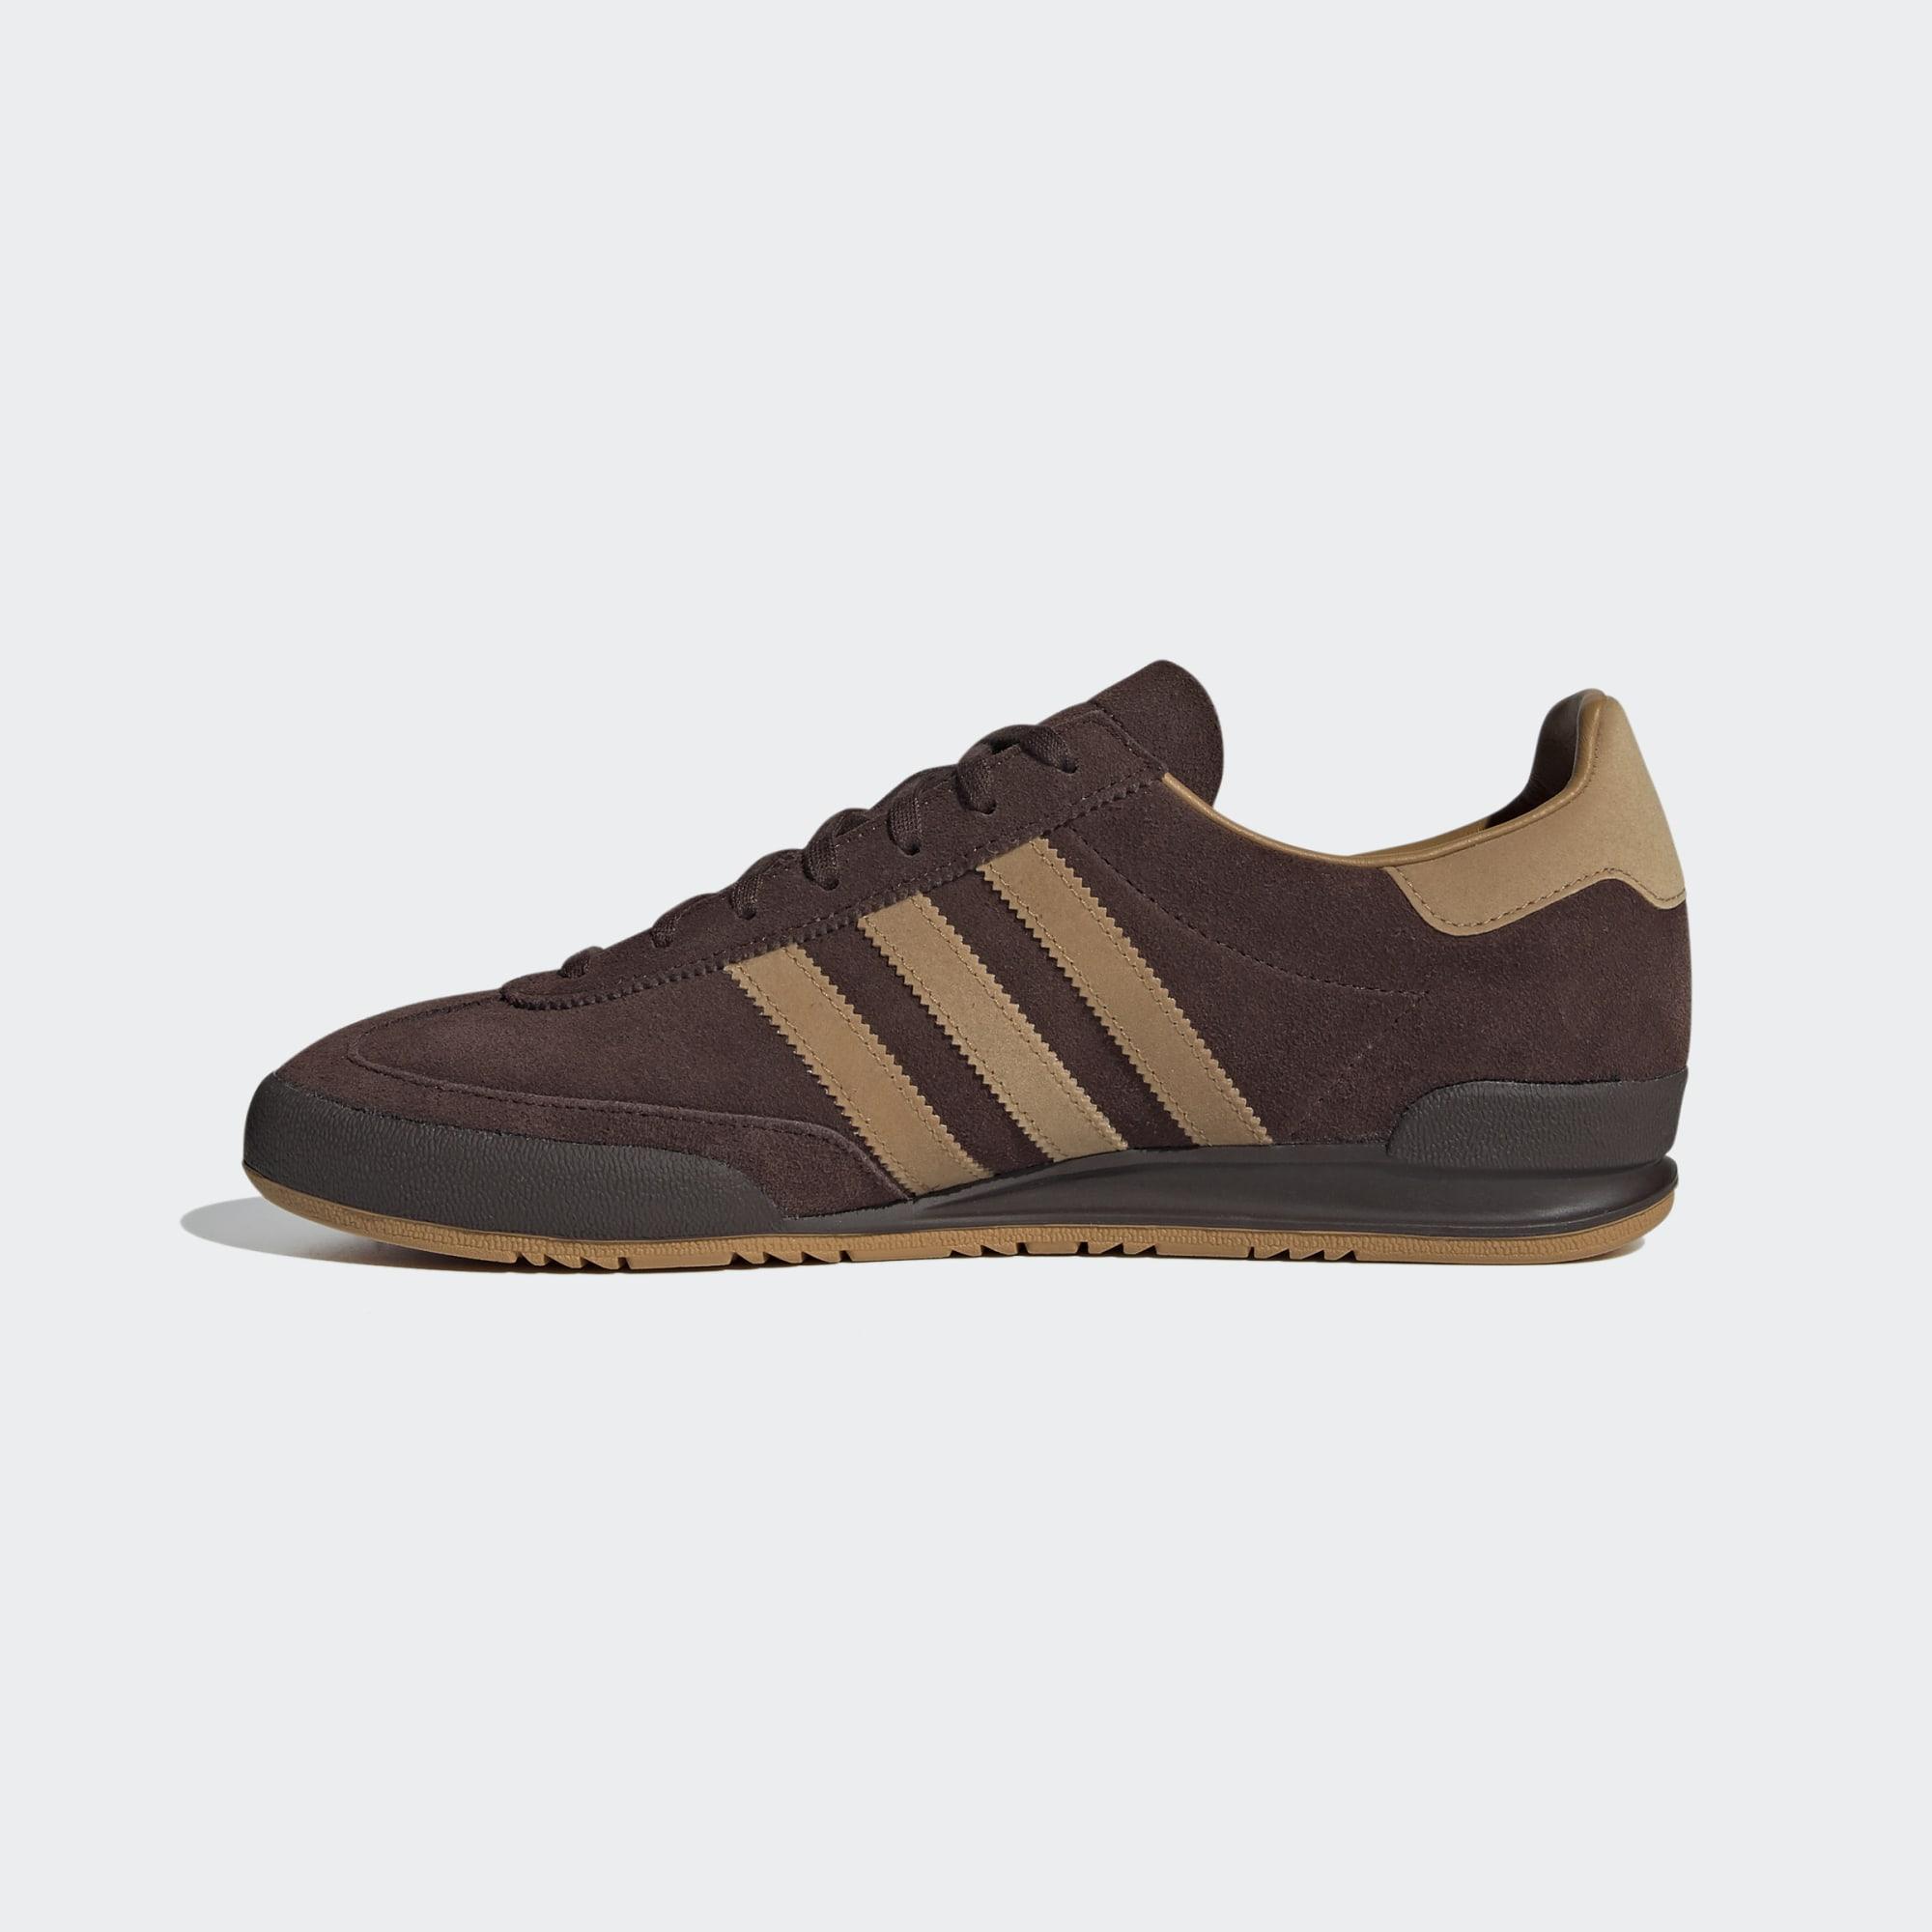 Cord_Shoes_Brun_H67630_06_standard.jpg